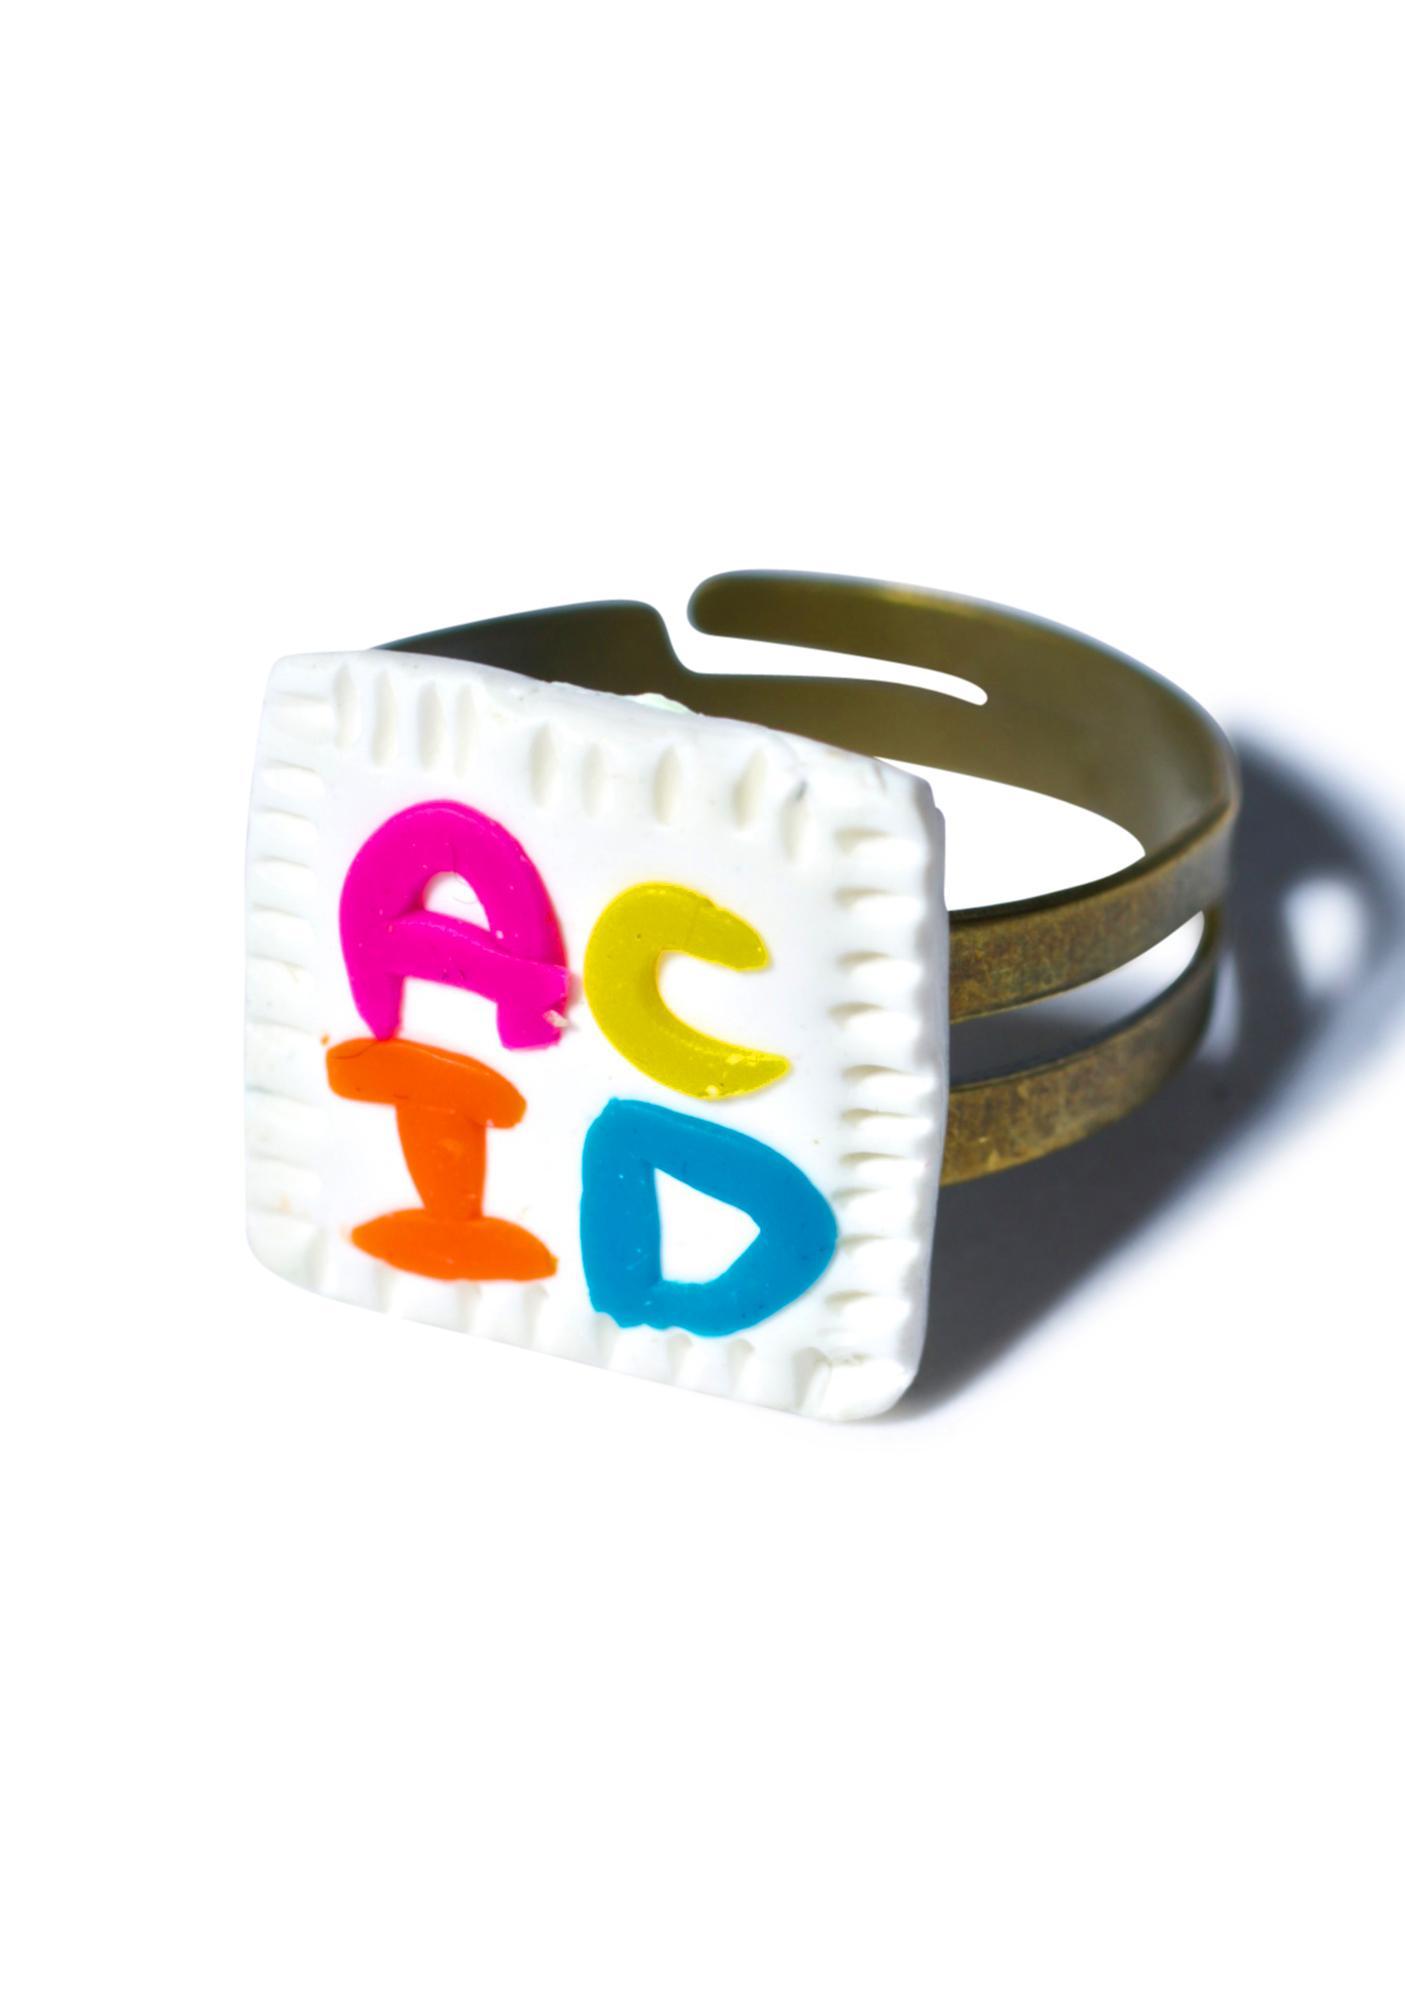 Wicked Hippie Acid Blotter Ring